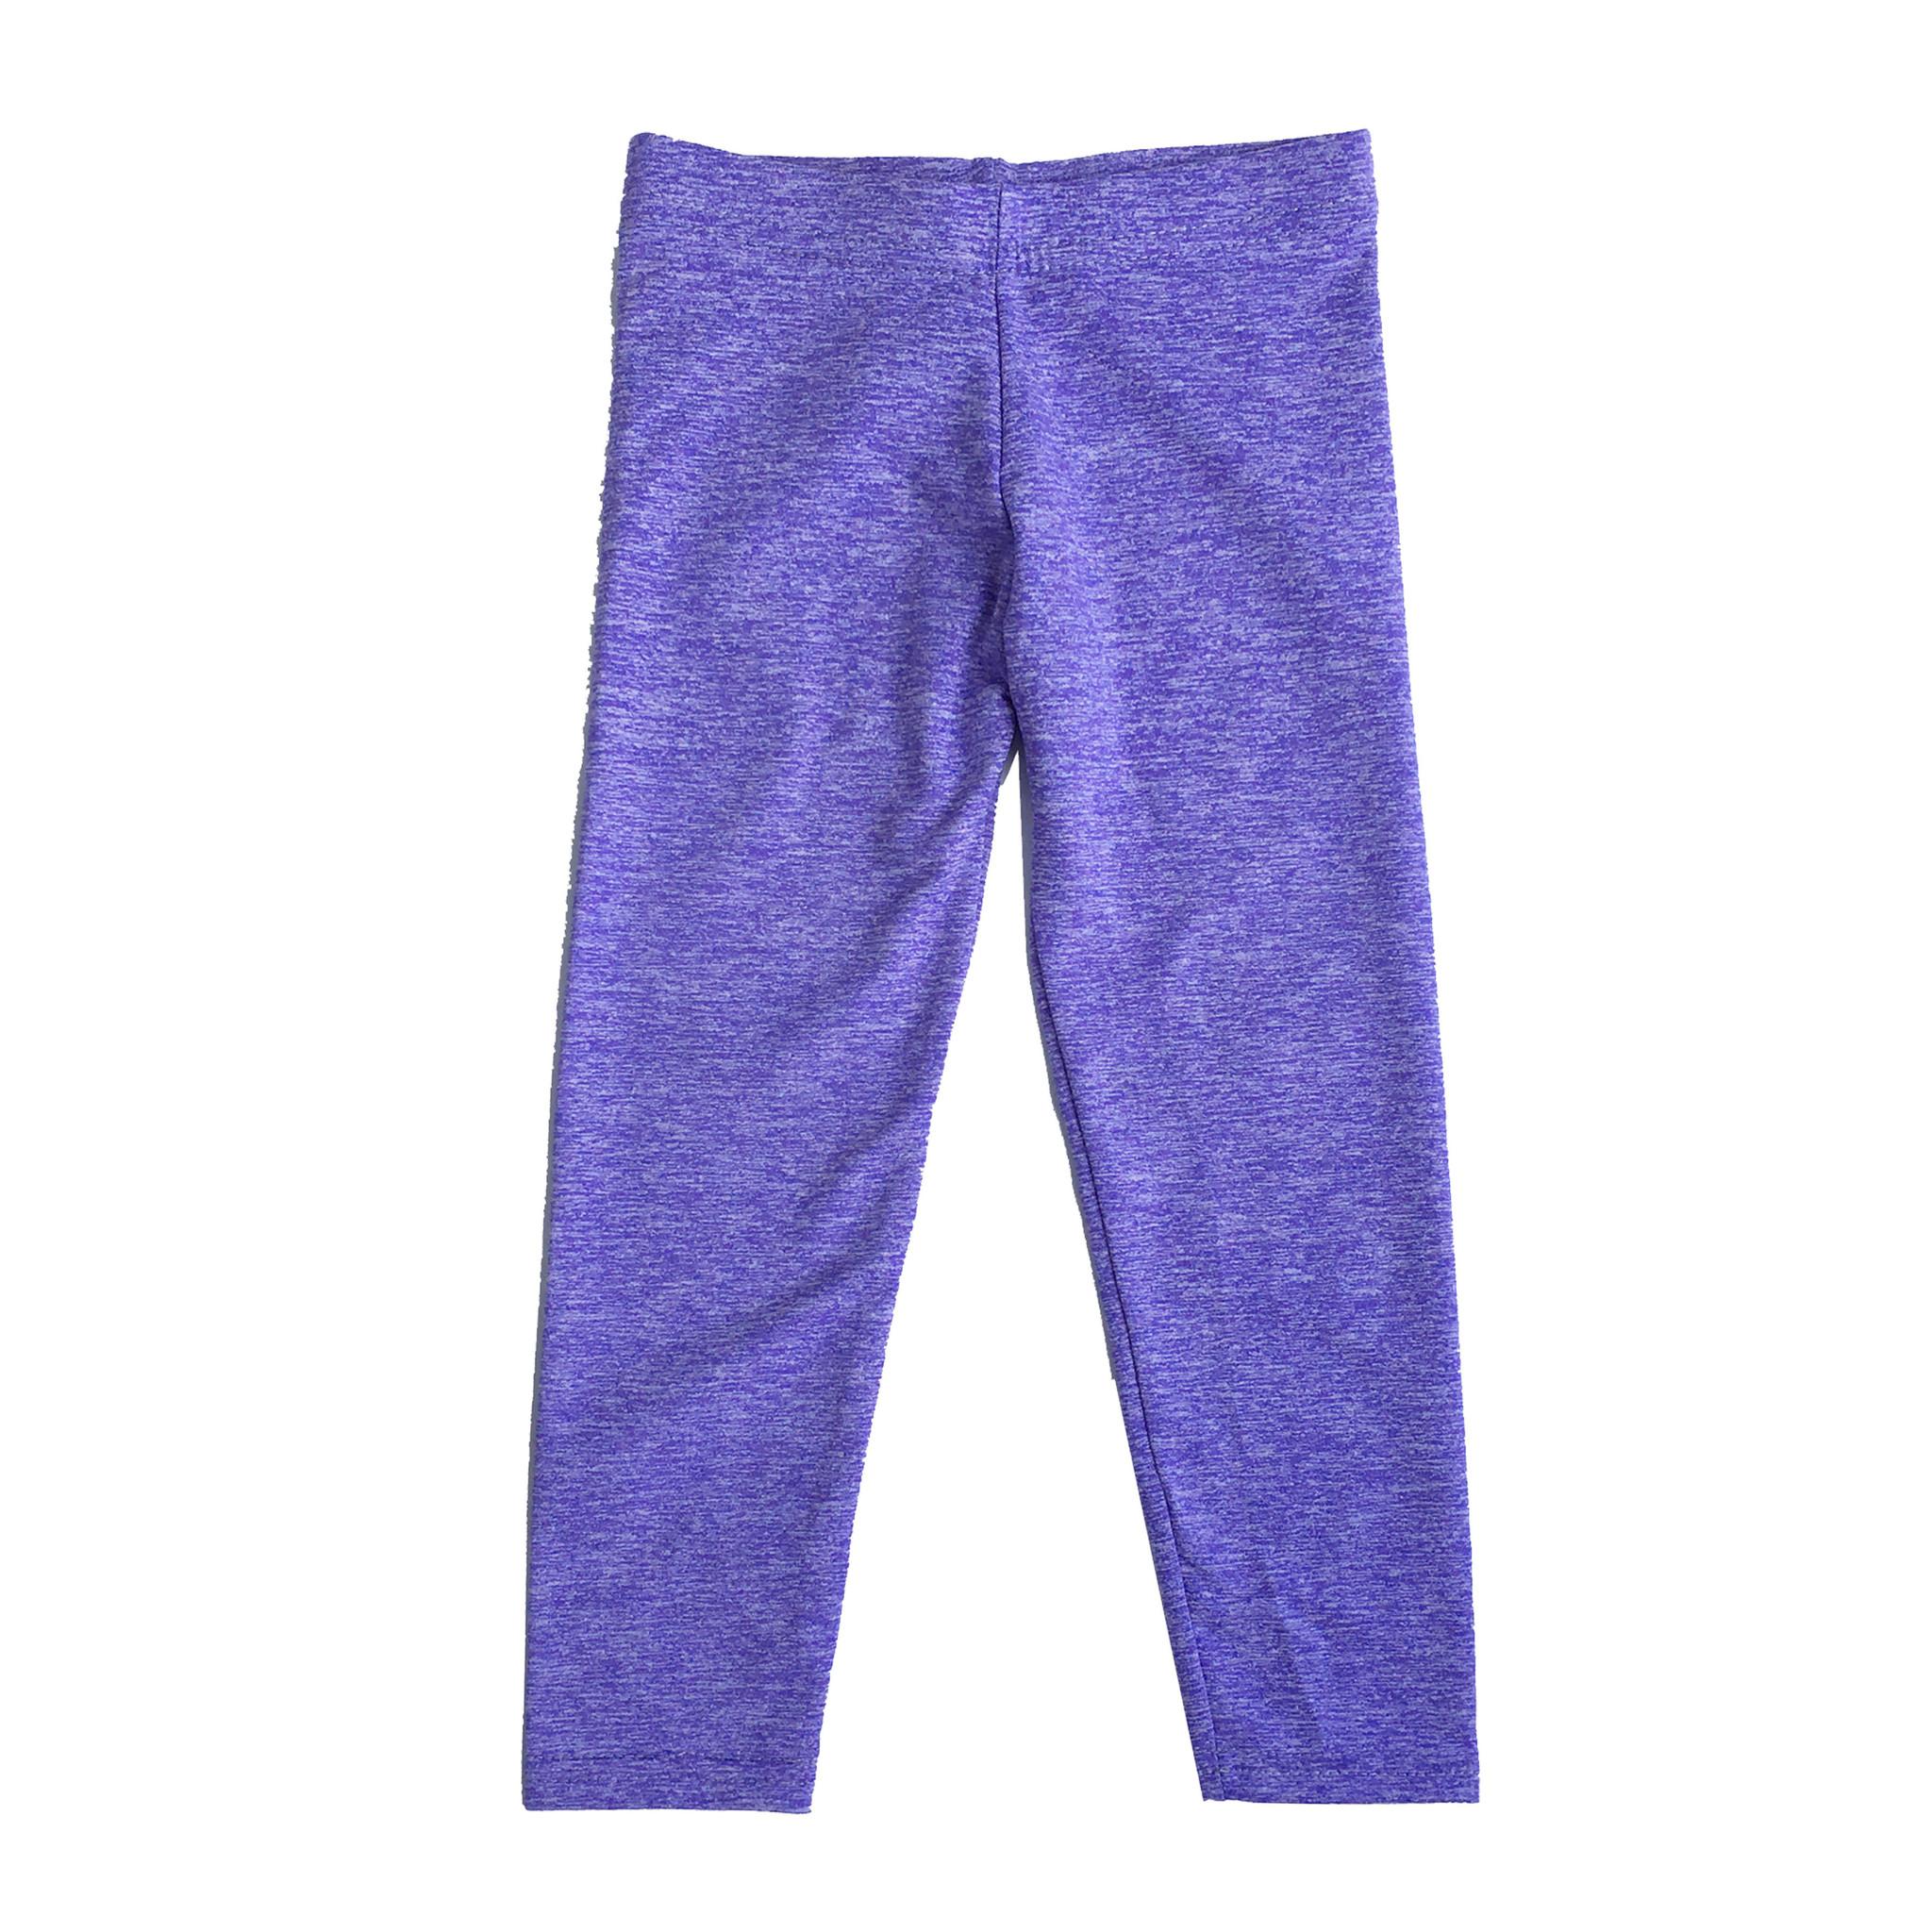 Dori Creations Violet/White Infant Heathered Legging